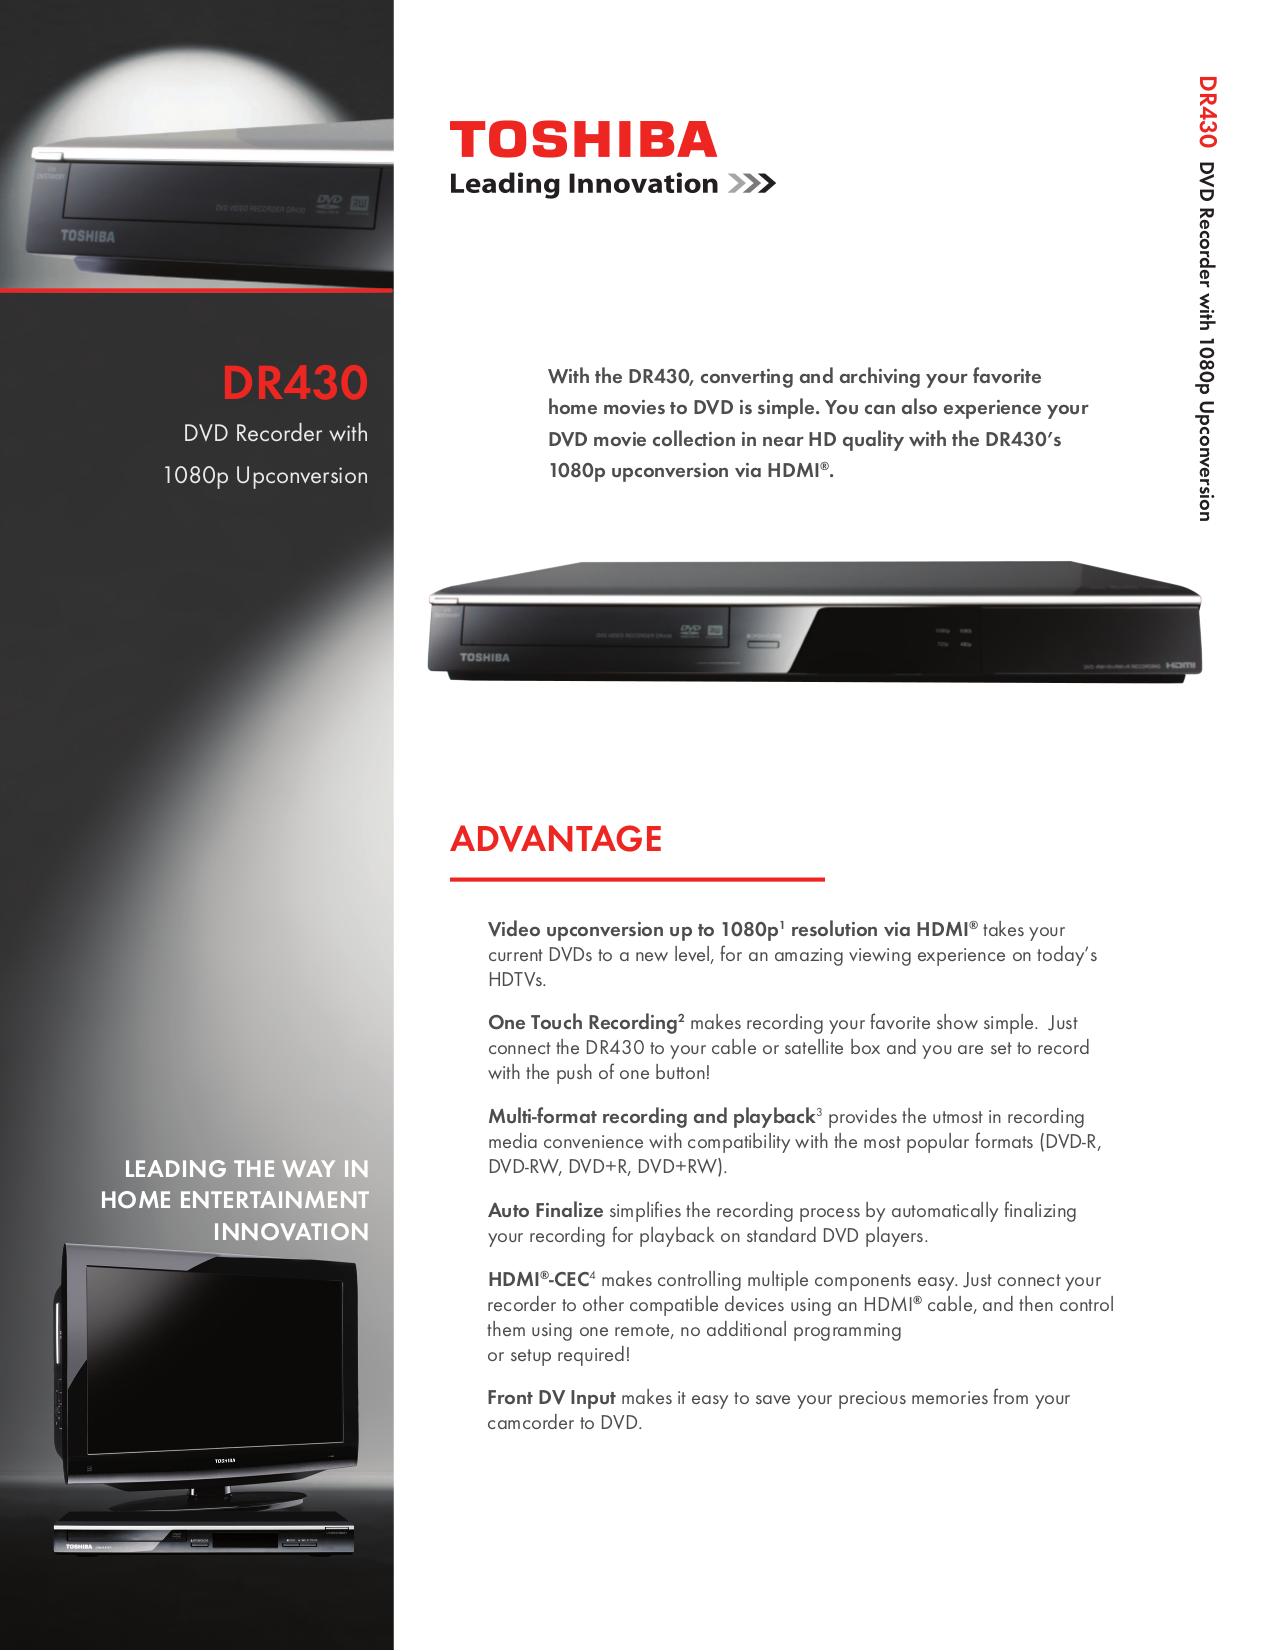 download free pdf for toshiba dr430 dvd players manual rh umlib com Toshiba DVD Recorder HD Toshiba DVD Recorder Inputs Outputs